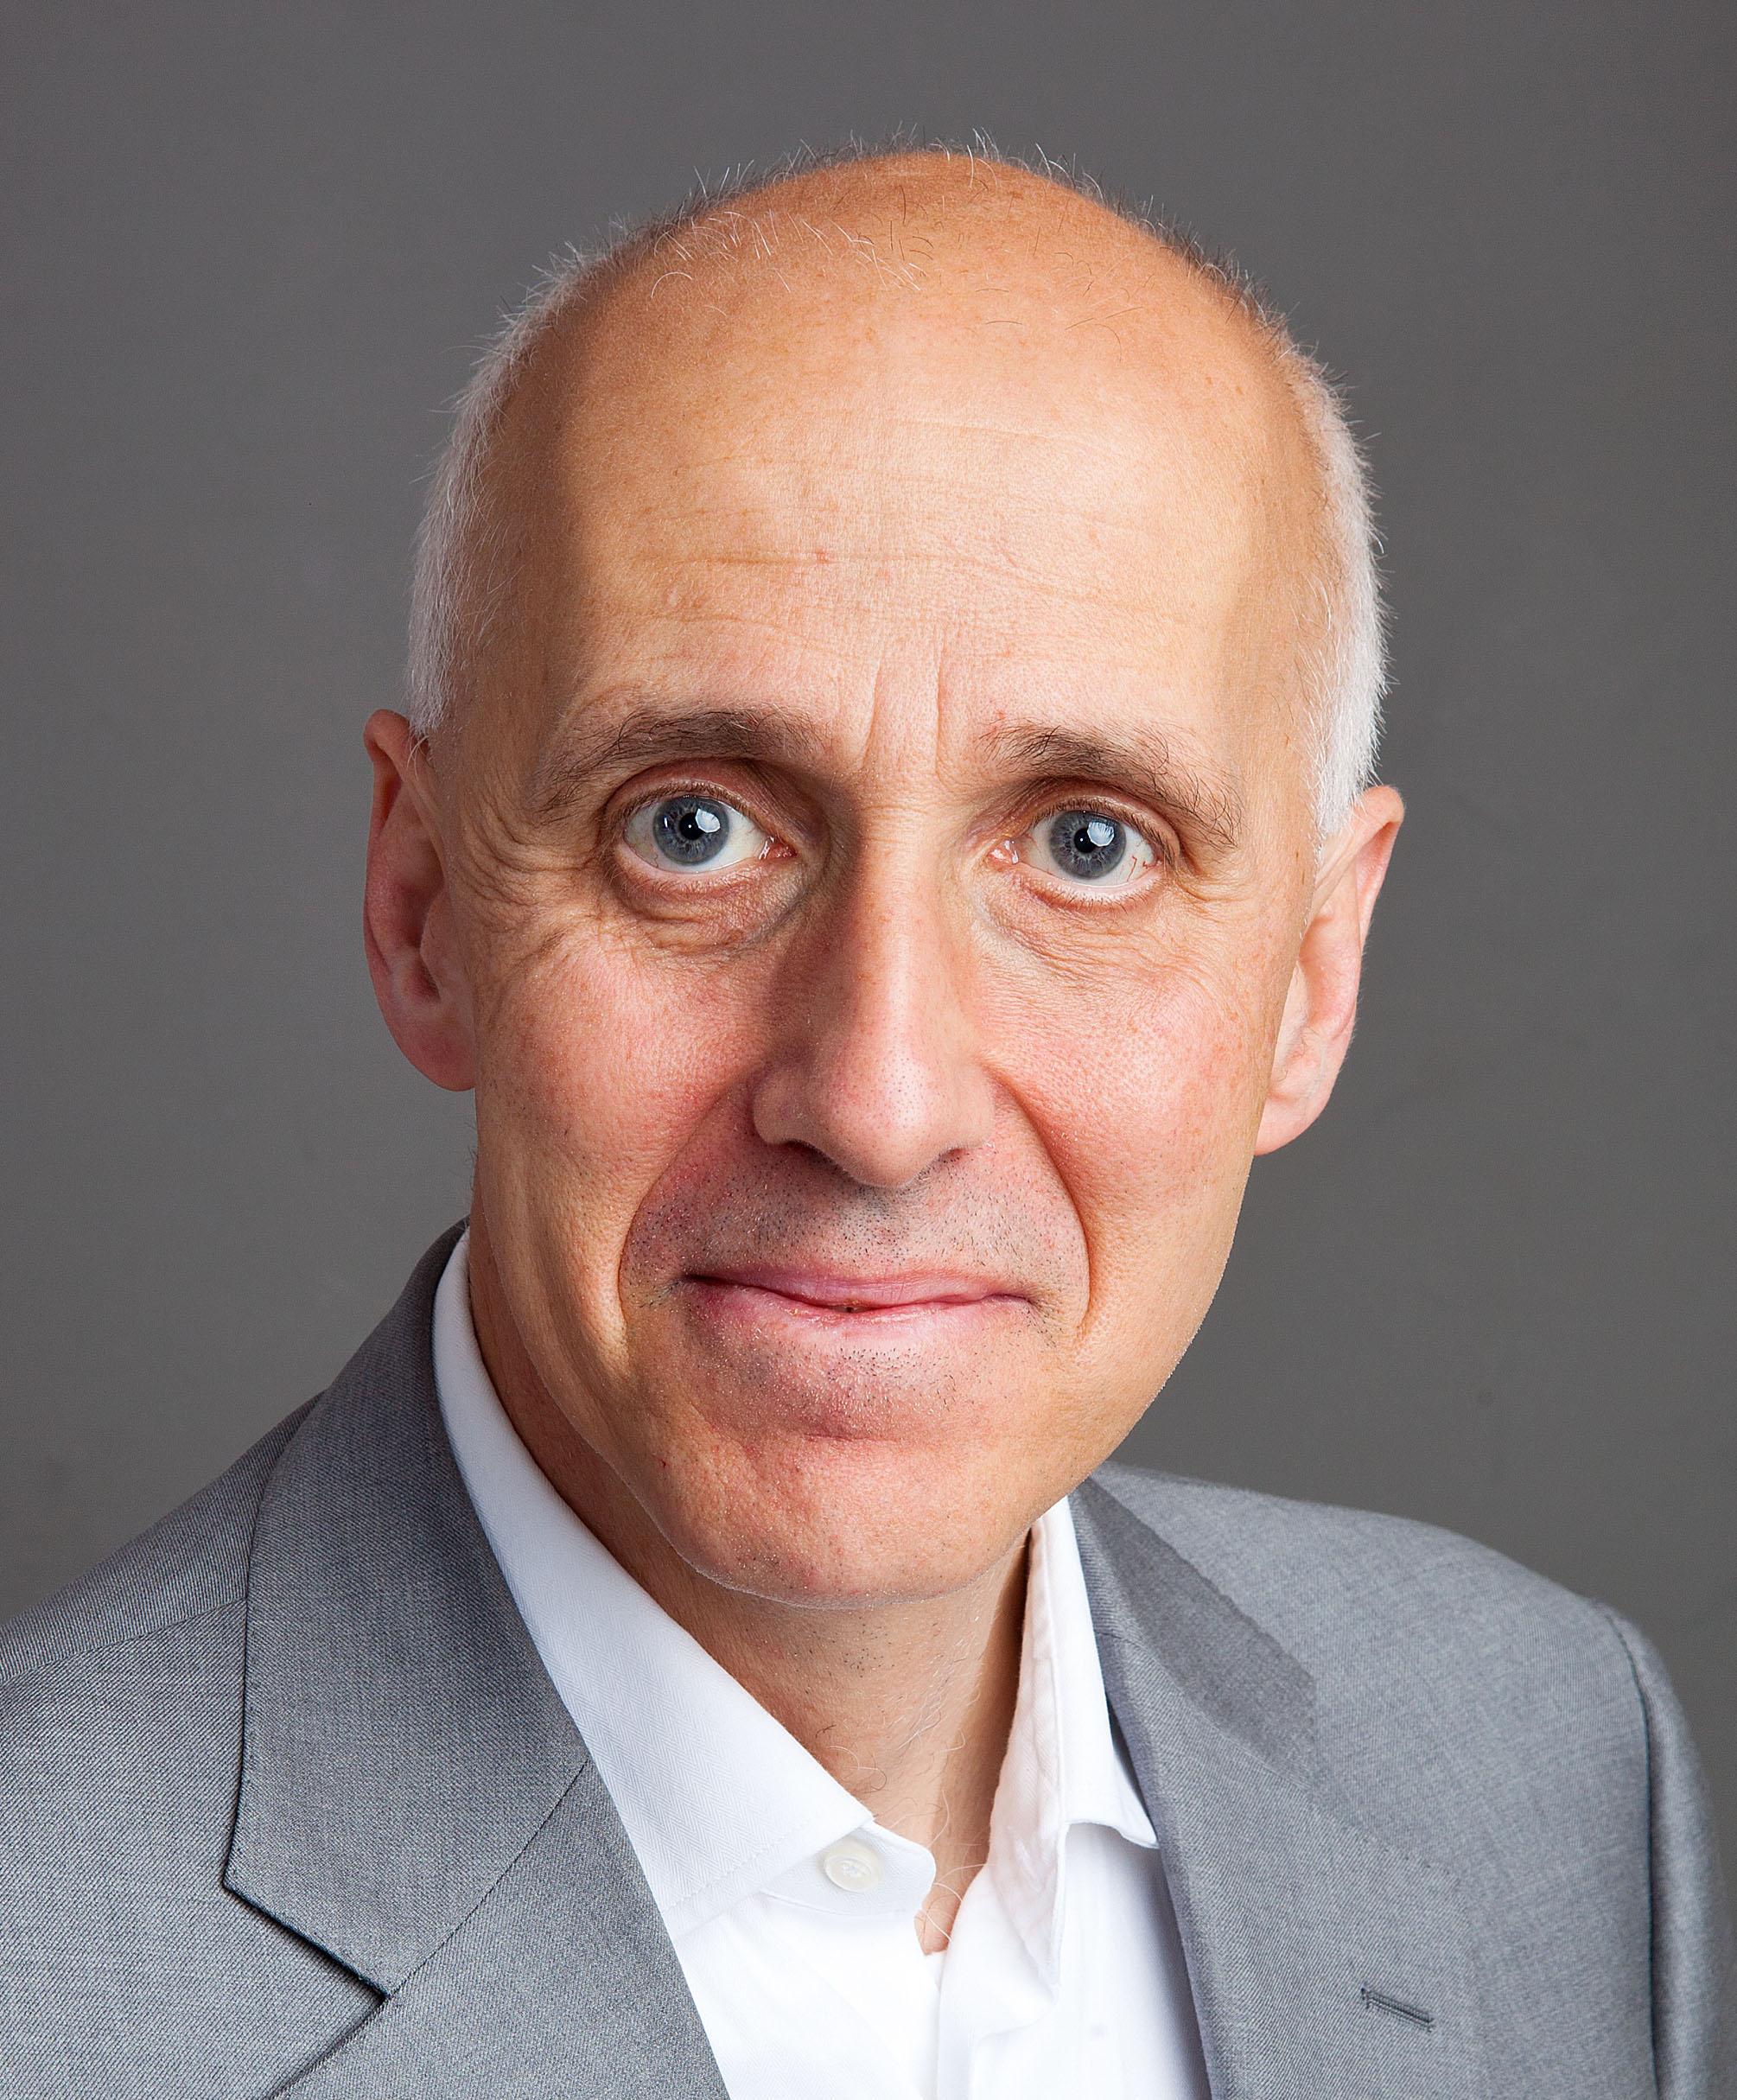 Dr Nick Scott-Ram